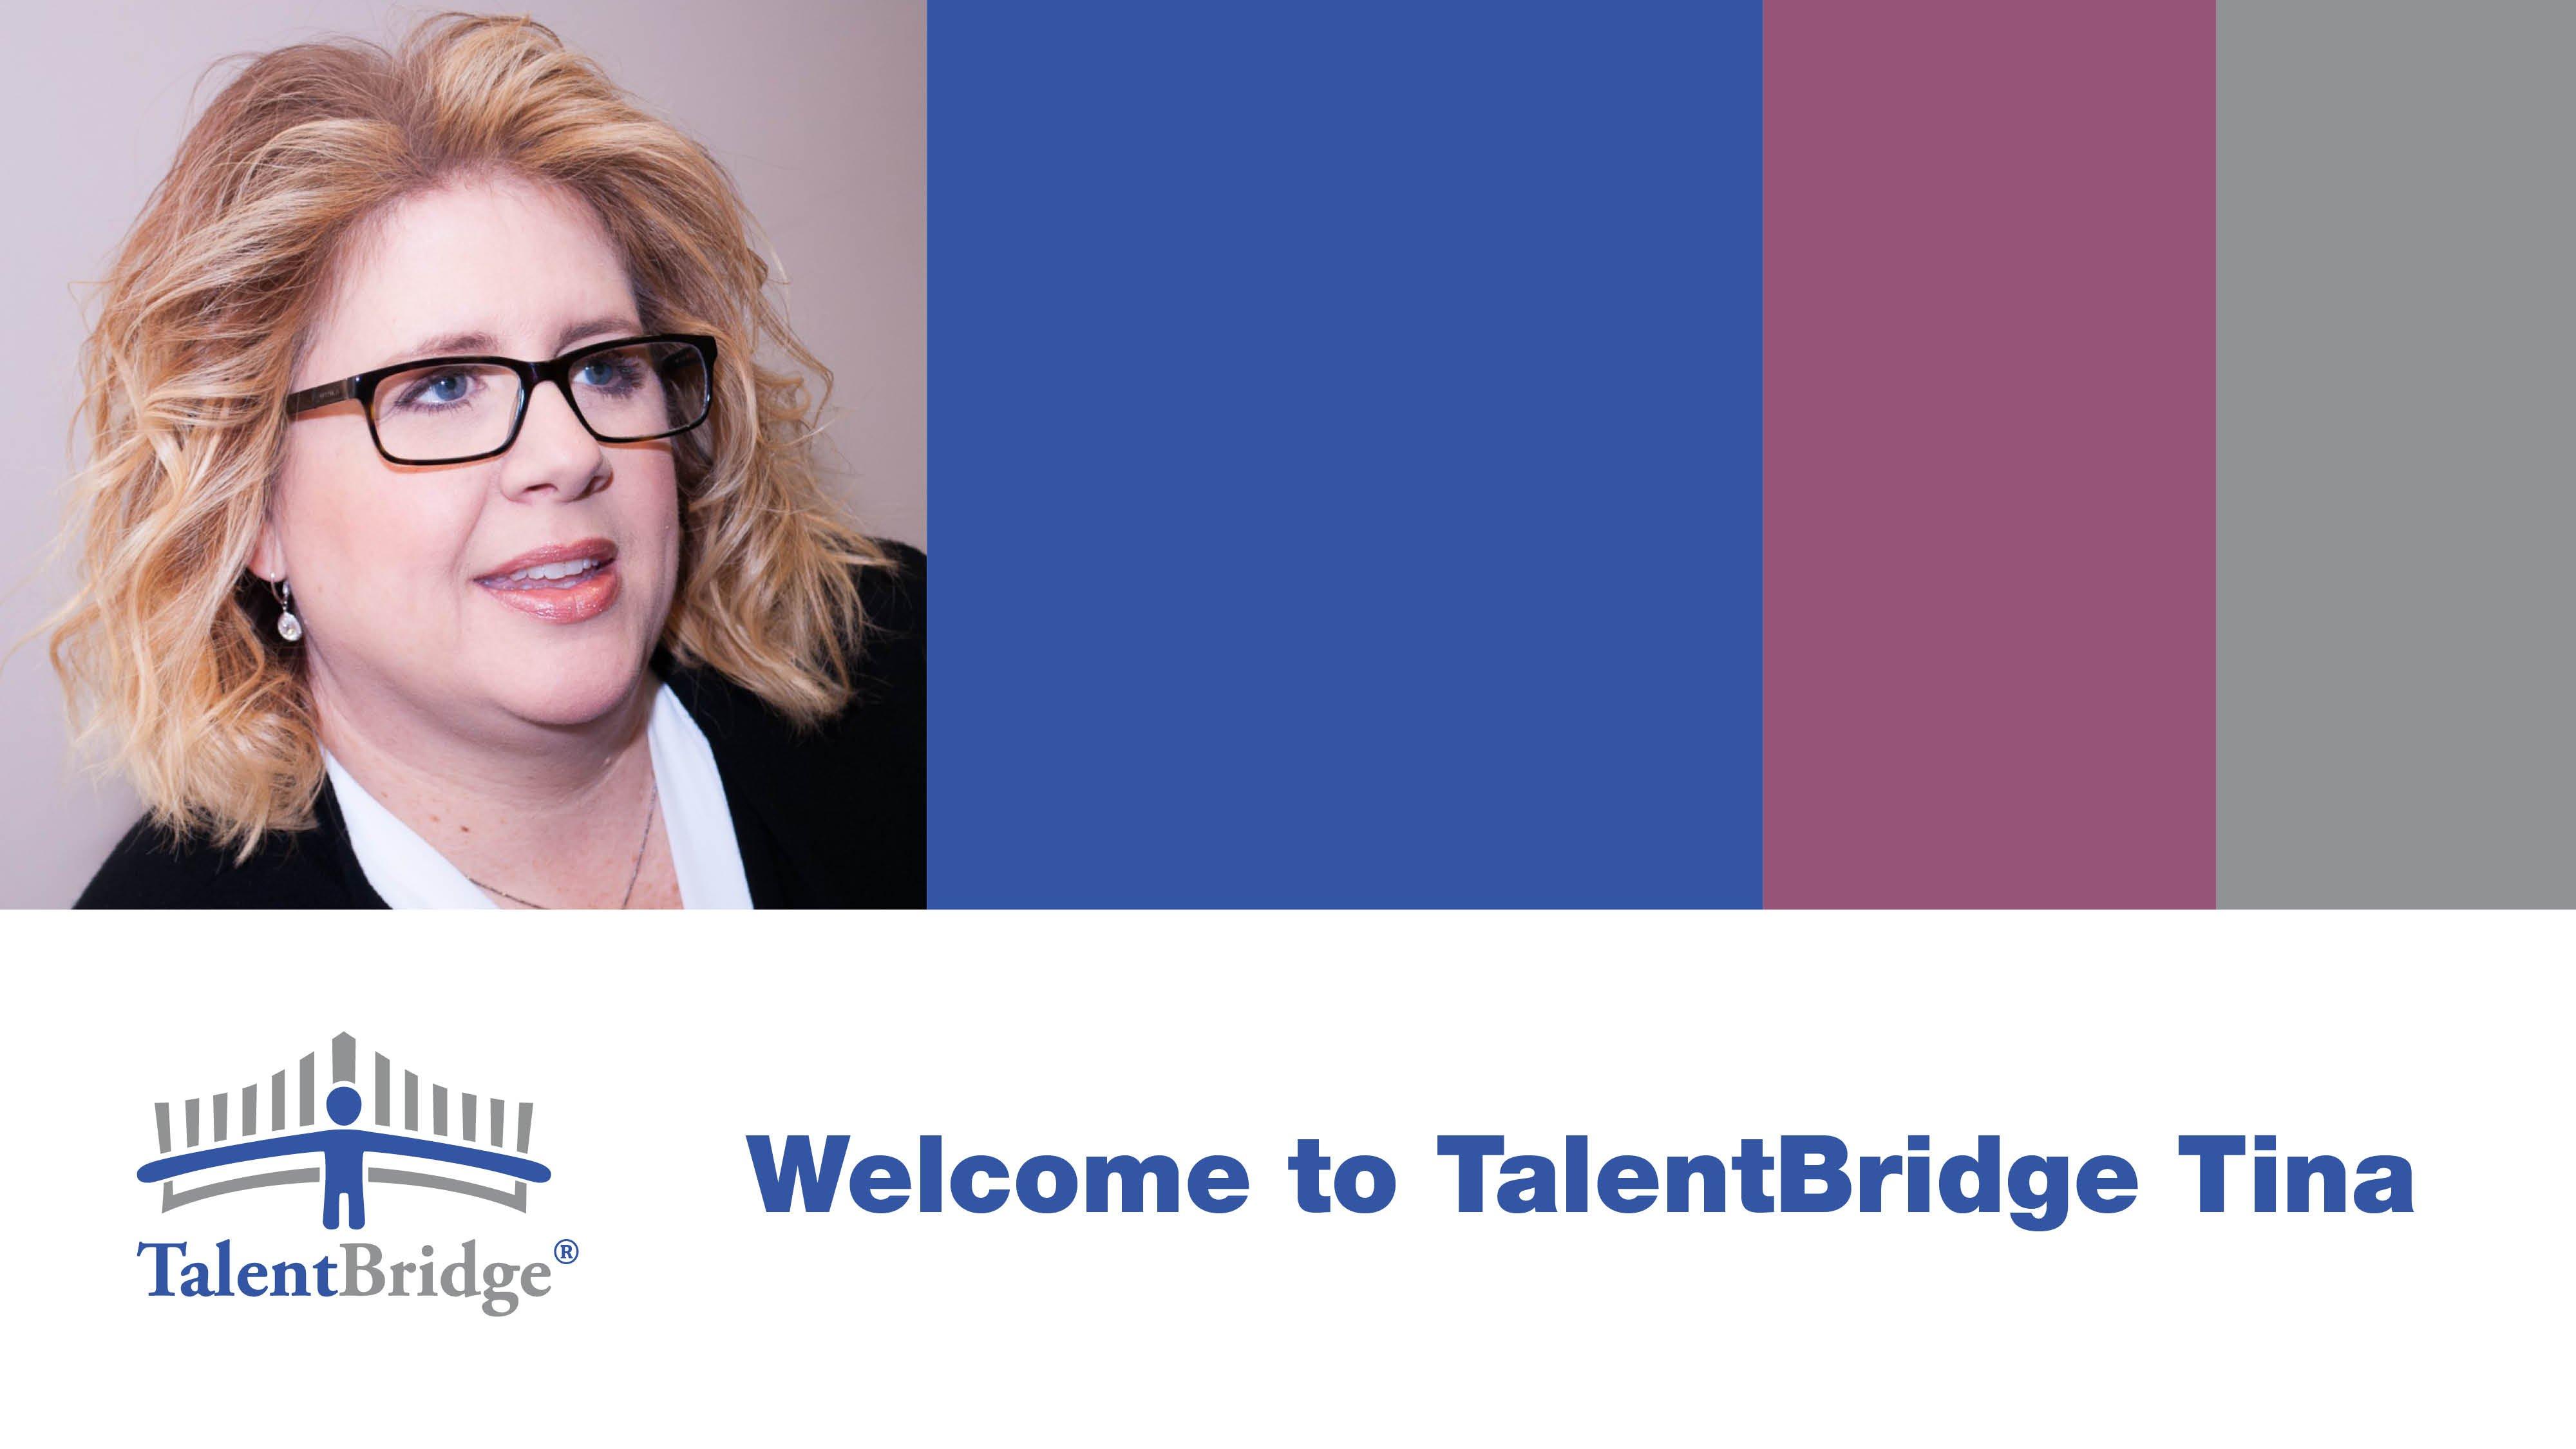 Tina Ruark-baker Joins The Talentbridge Team